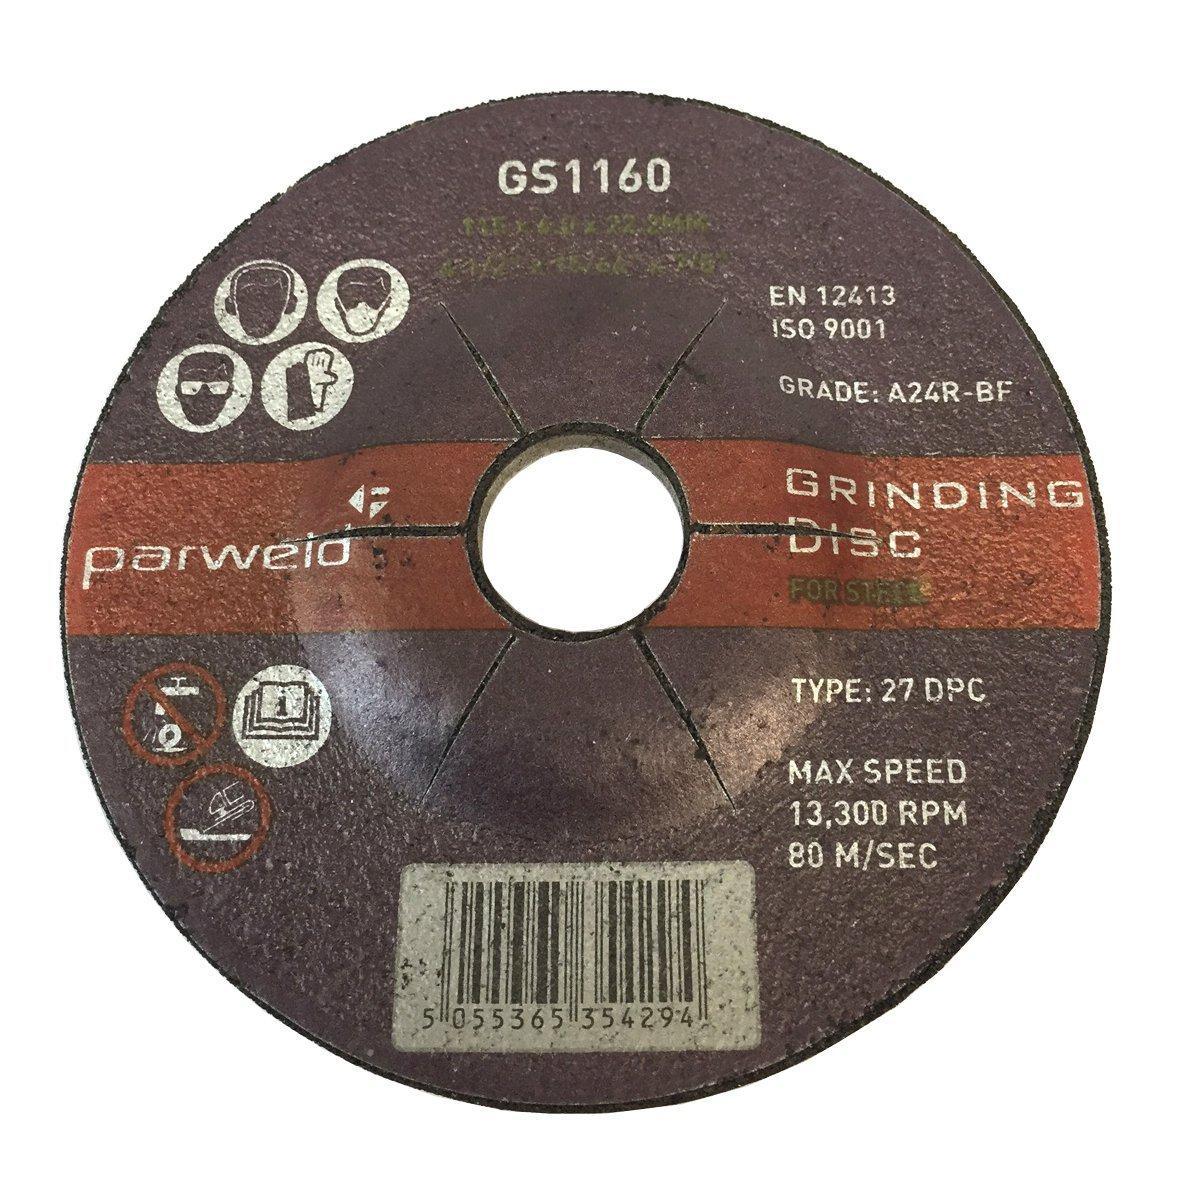 4.5 Parweld 115mm Grinding discs for steel 115 x 6.0 x 22.2mm PACK OF 100